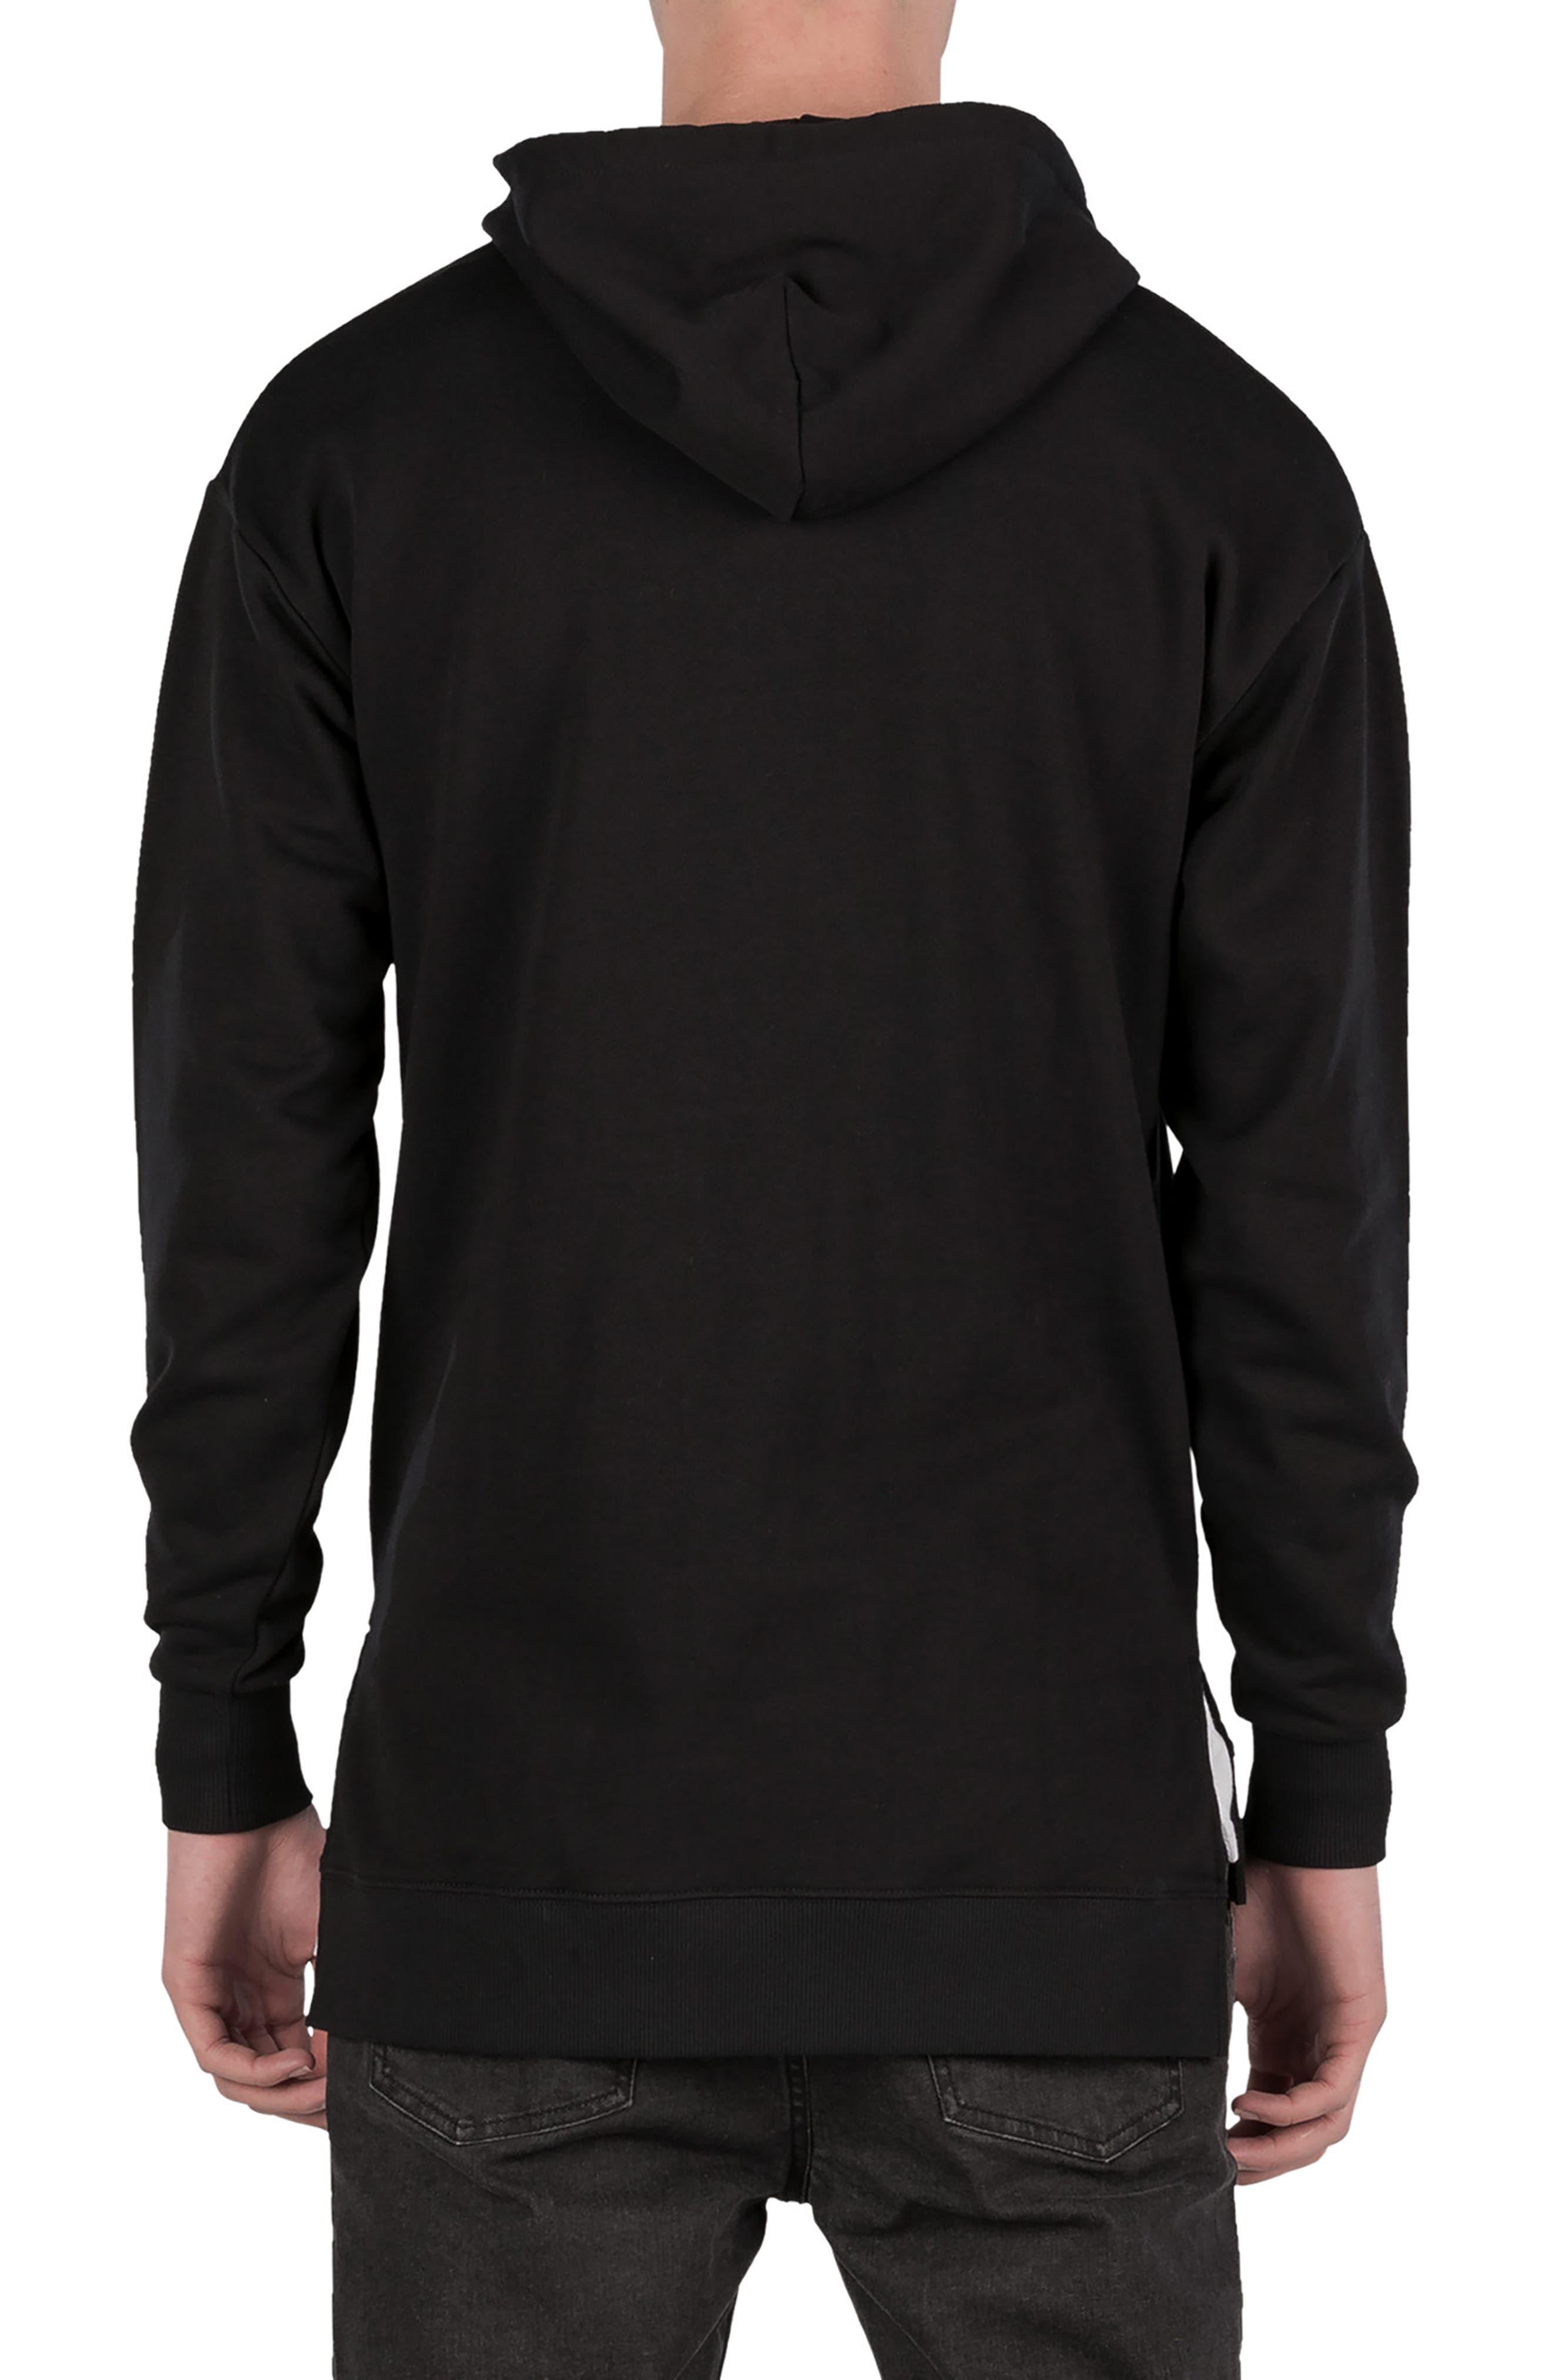 Rugger Hooded Sweatshirt,                             Alternate thumbnail 2, color,                             BLACK